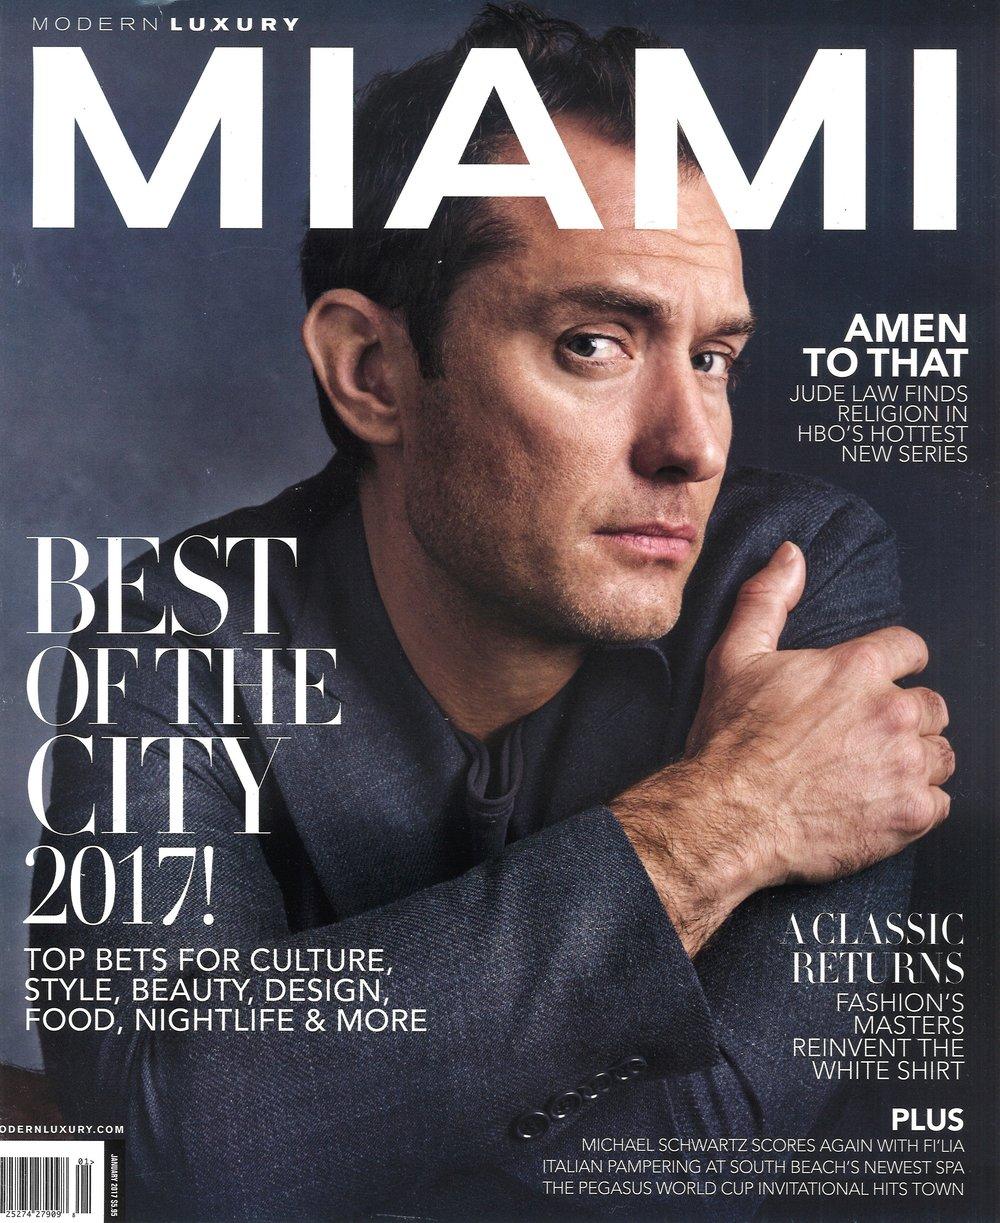 ML Miami jan17 cover.jpg